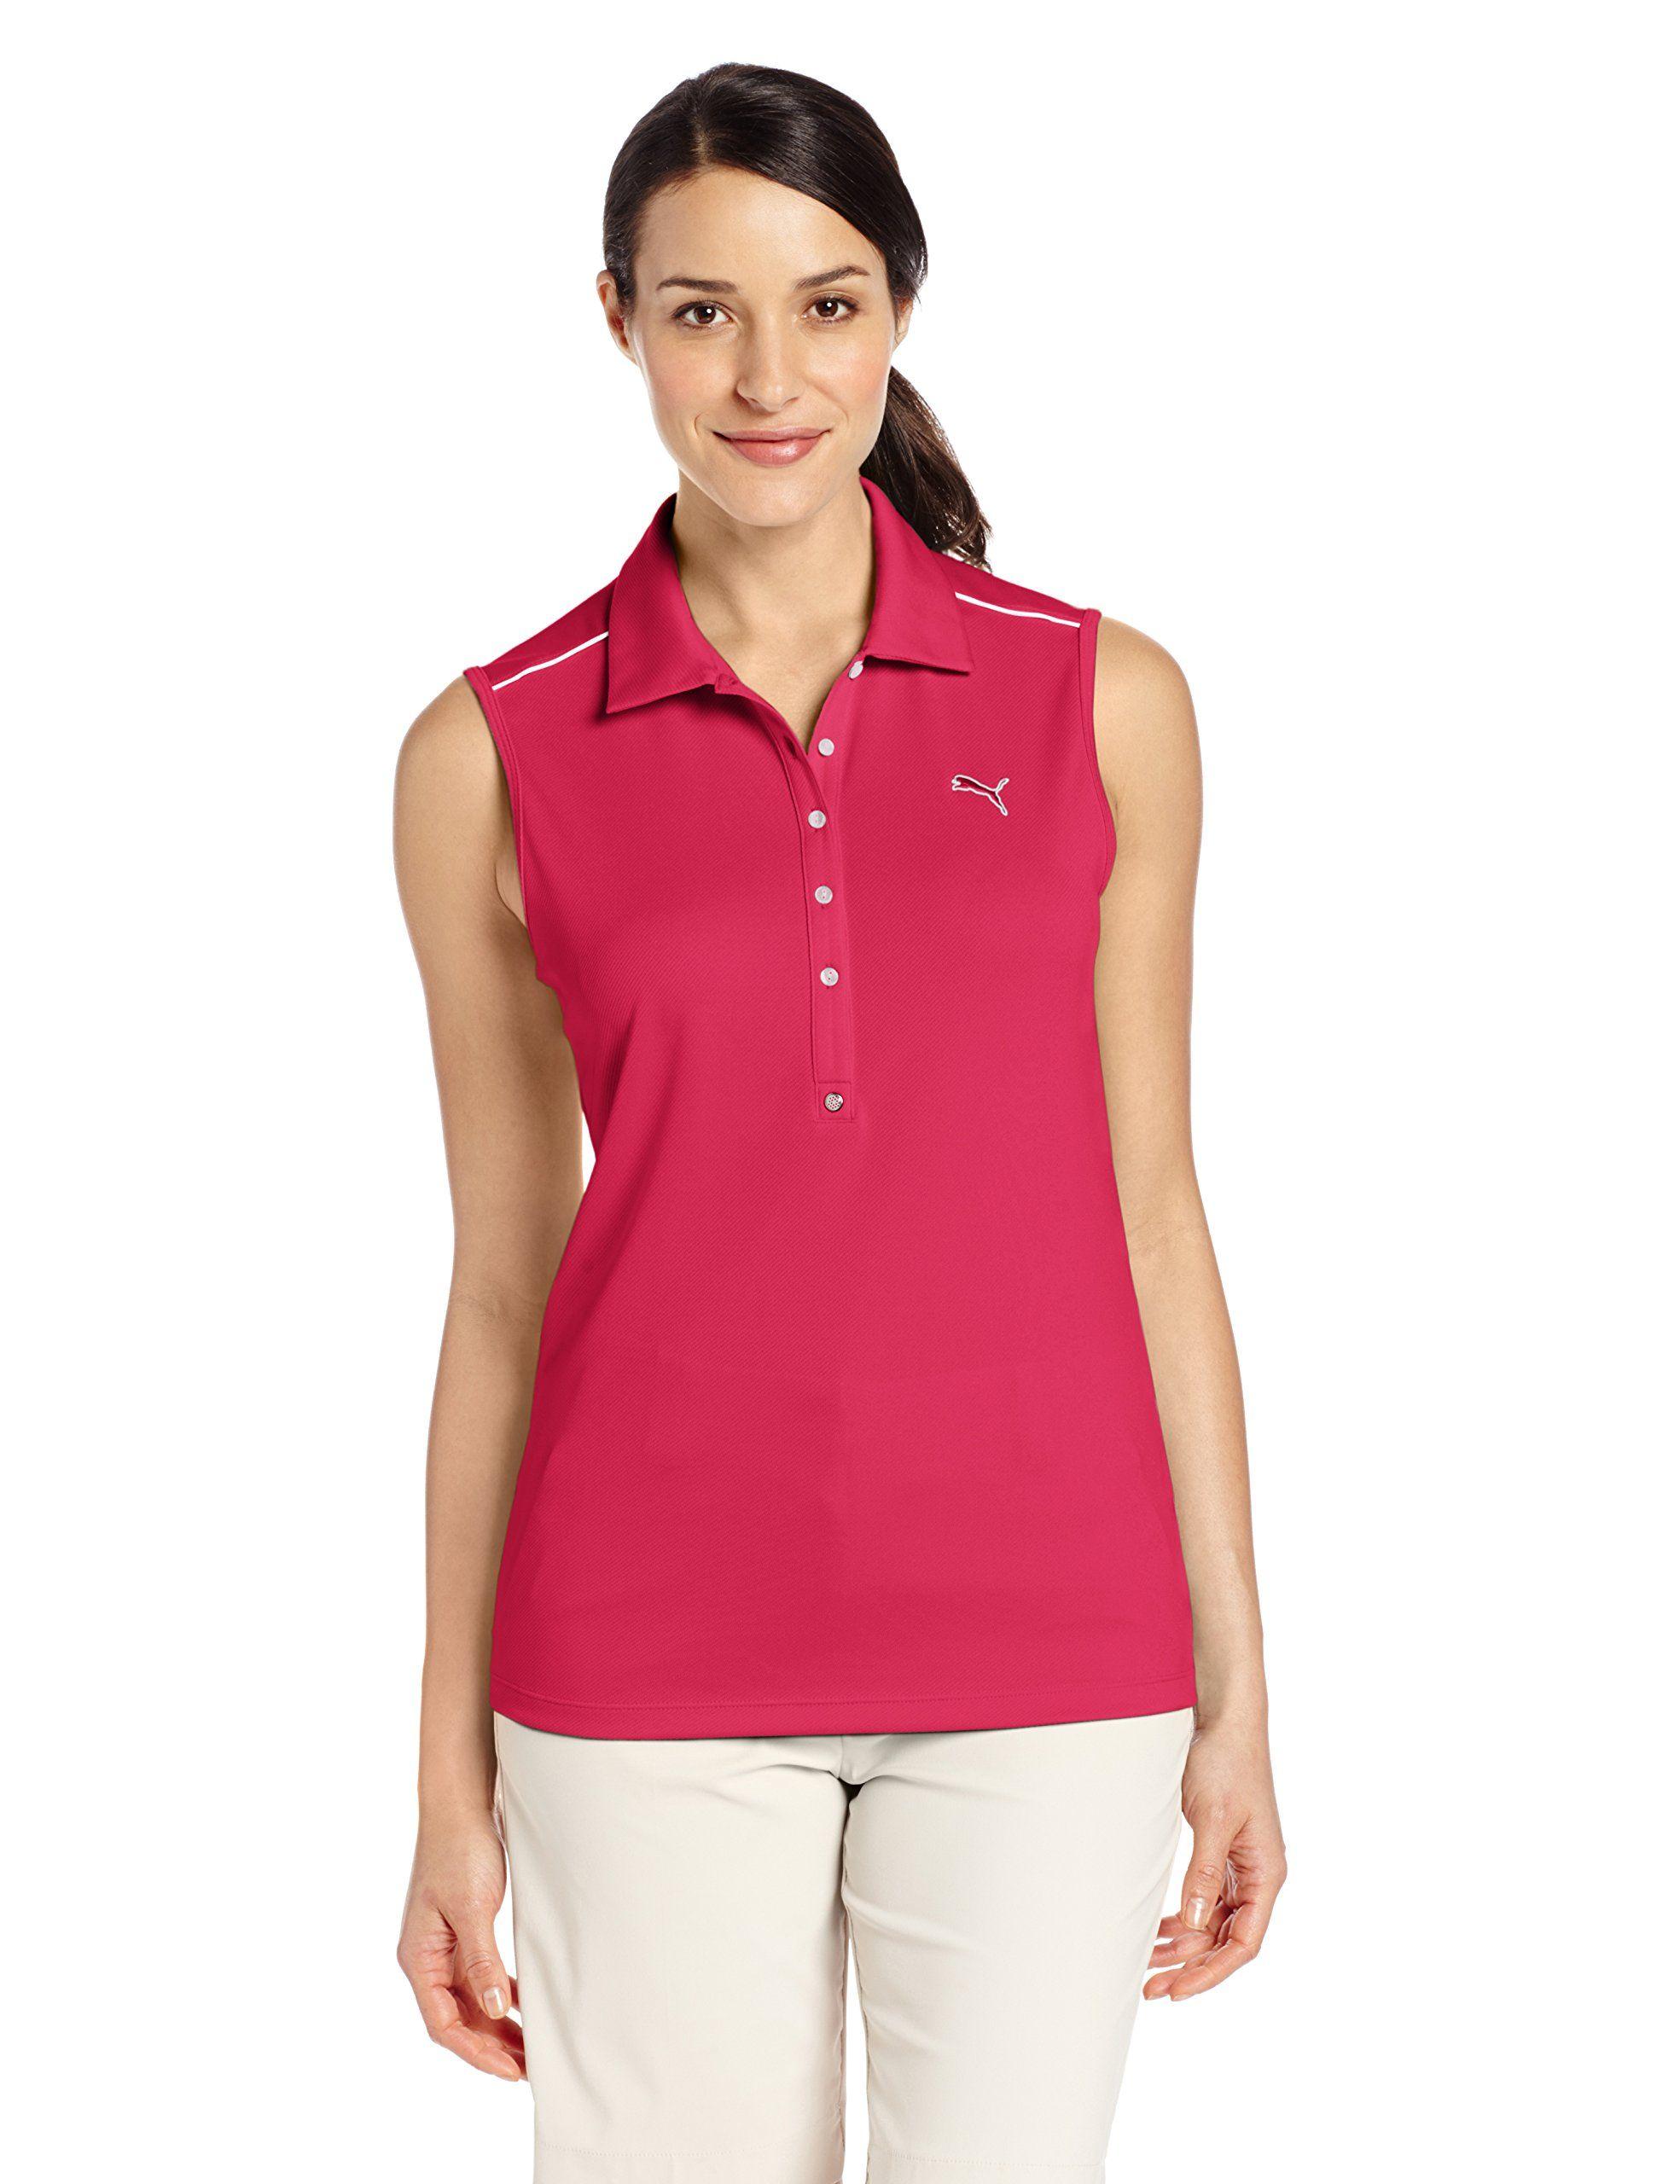 7b980f0168235 Women Golf Clothing - PUMA Golf NA Womens Tech Sleeveless Polo Fuchsia  Purple Small